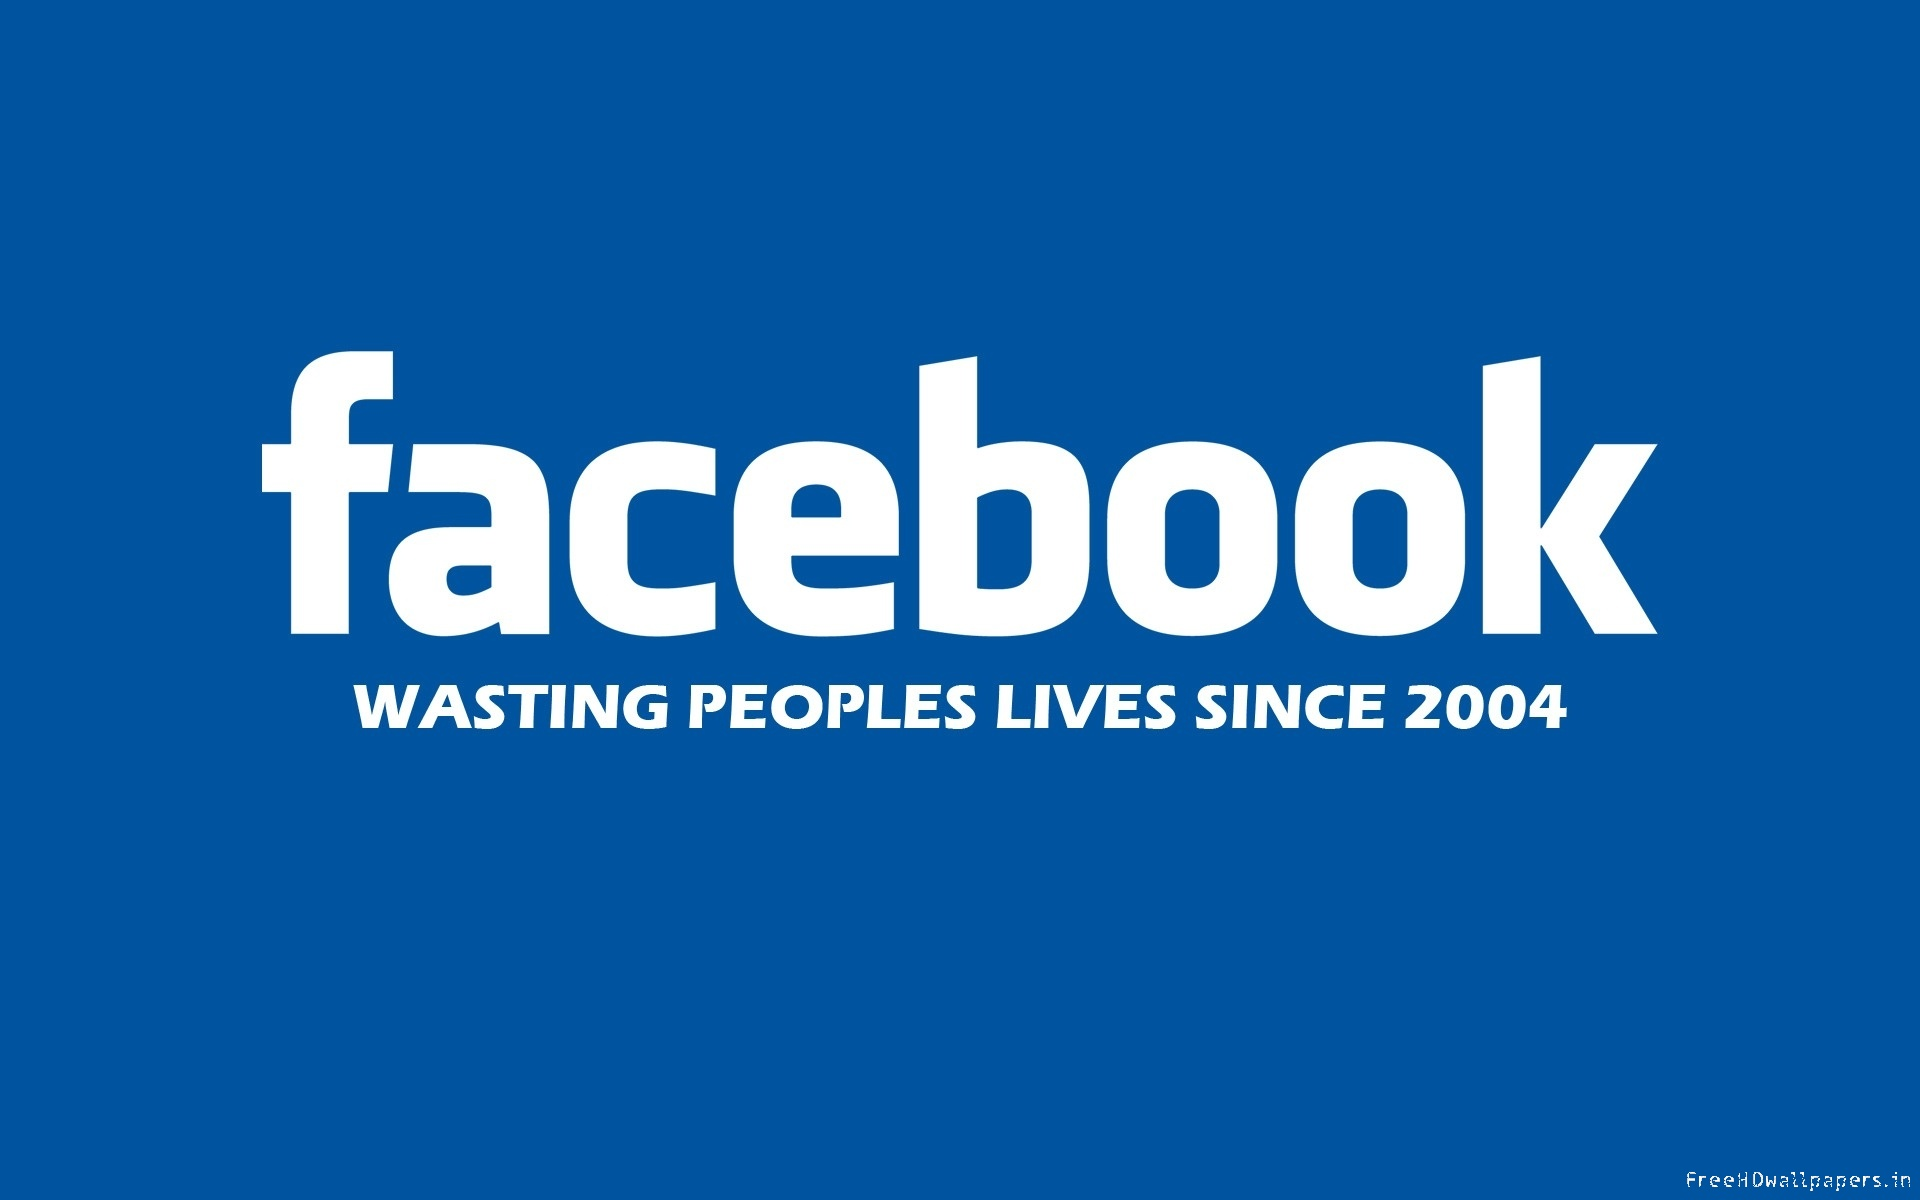 description facebook wallpaper is - photo #9